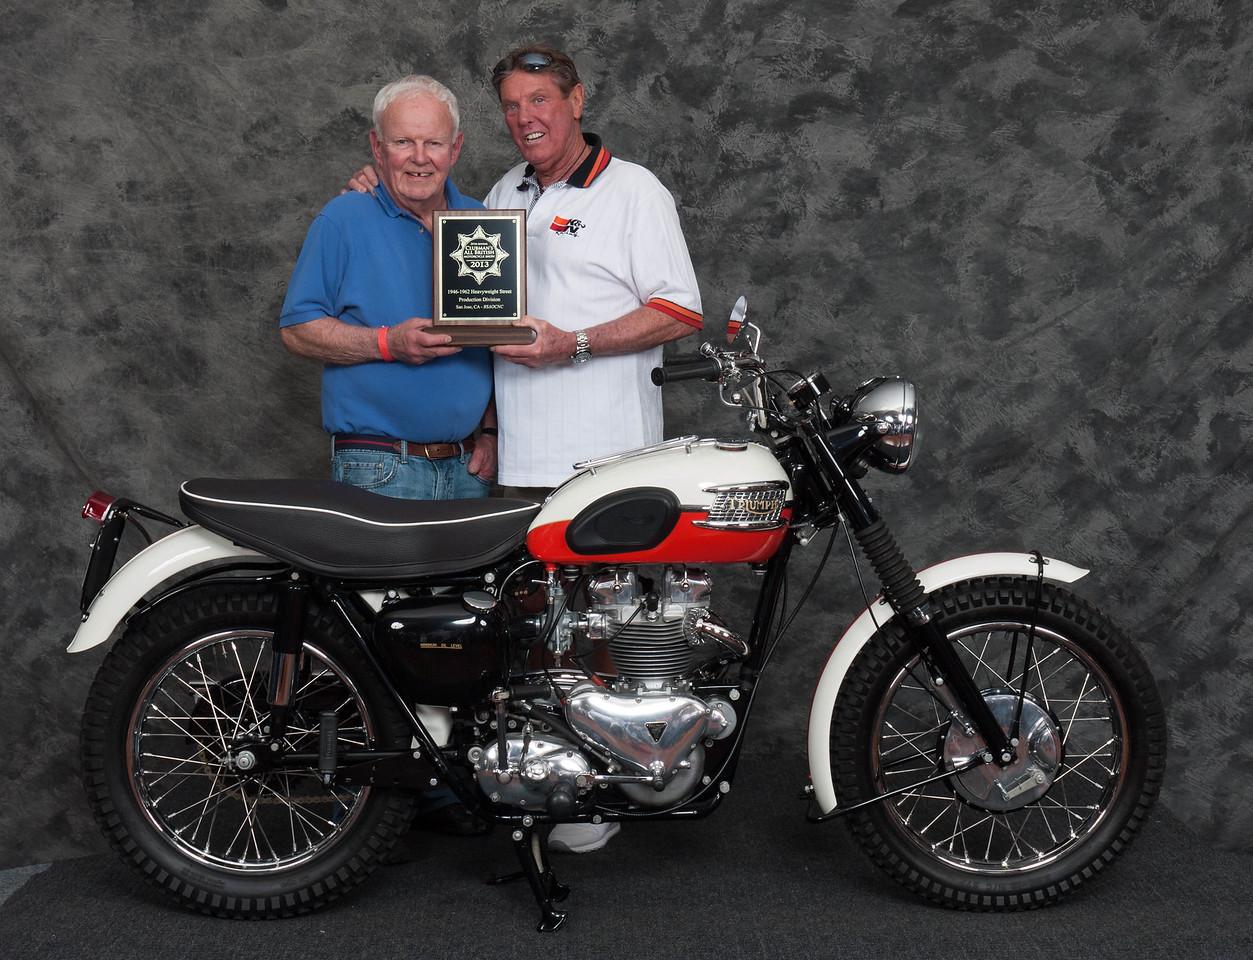 John Niesley, Winner of Street Heavyweight 1946-1962 Production Class - 1957 Triumph TR6 Trophy